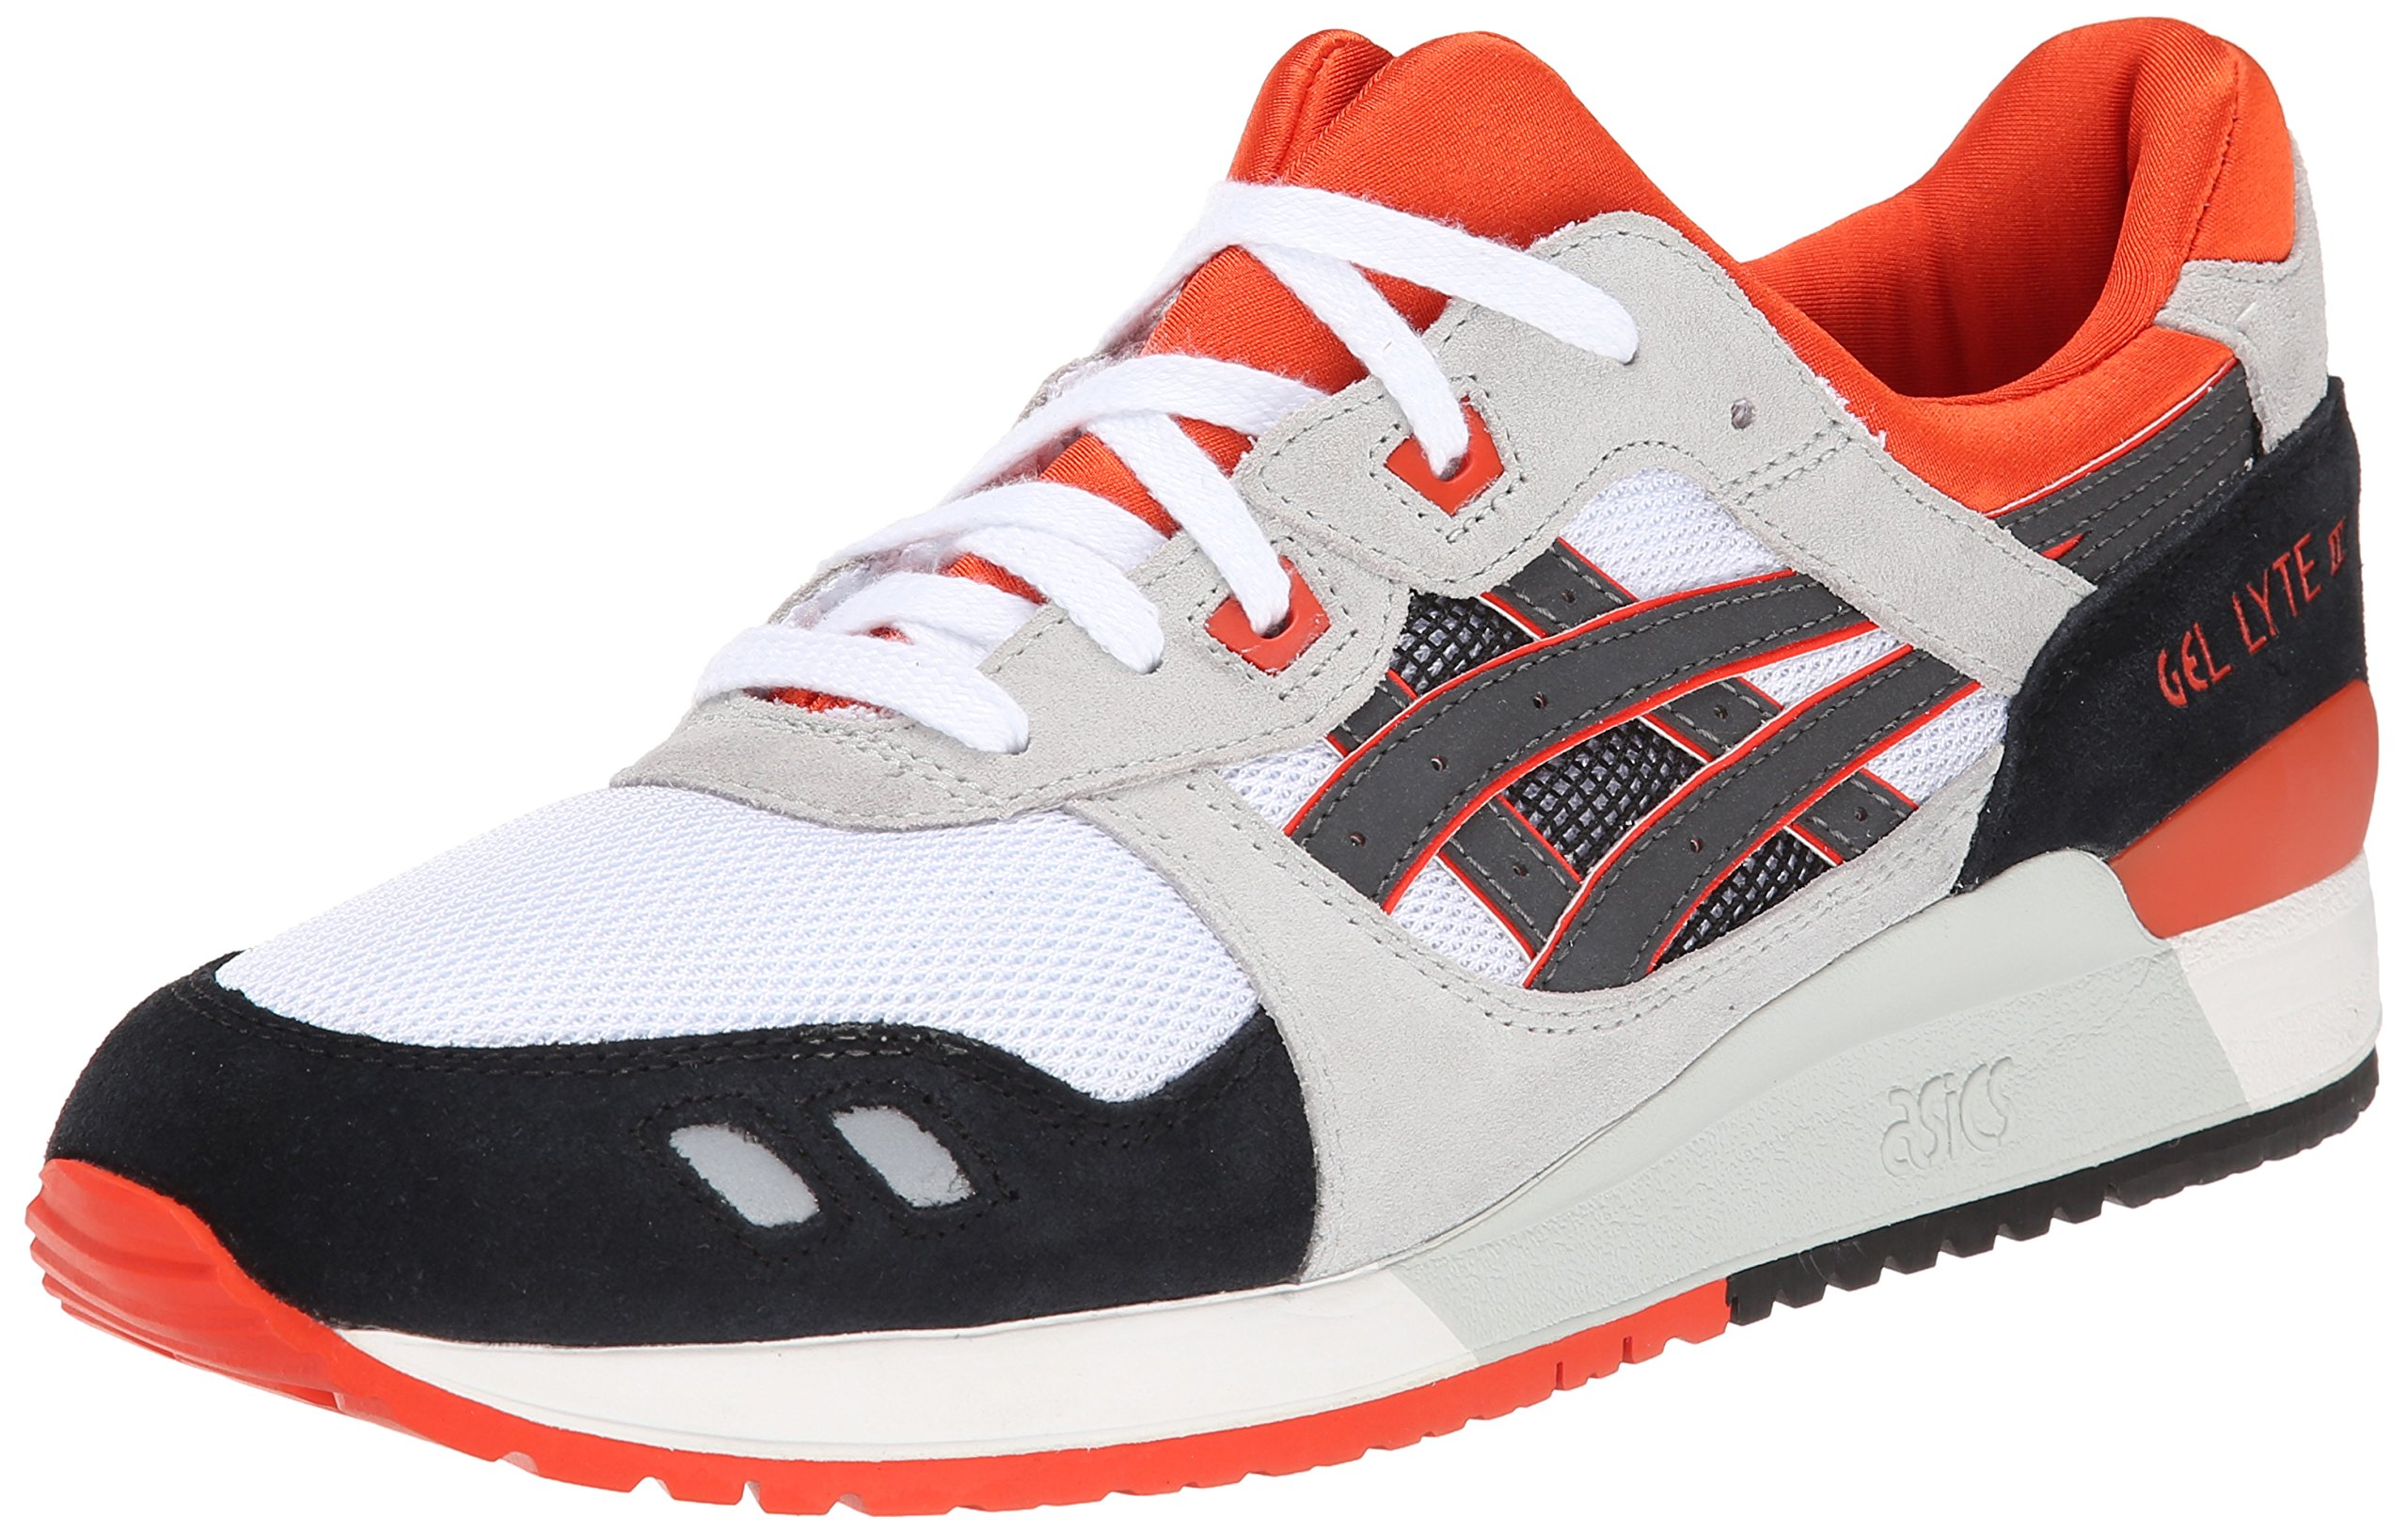 4eacce7ed436 Galleon - ASICS Men s Gel-Lyte III Retro Running Shoe